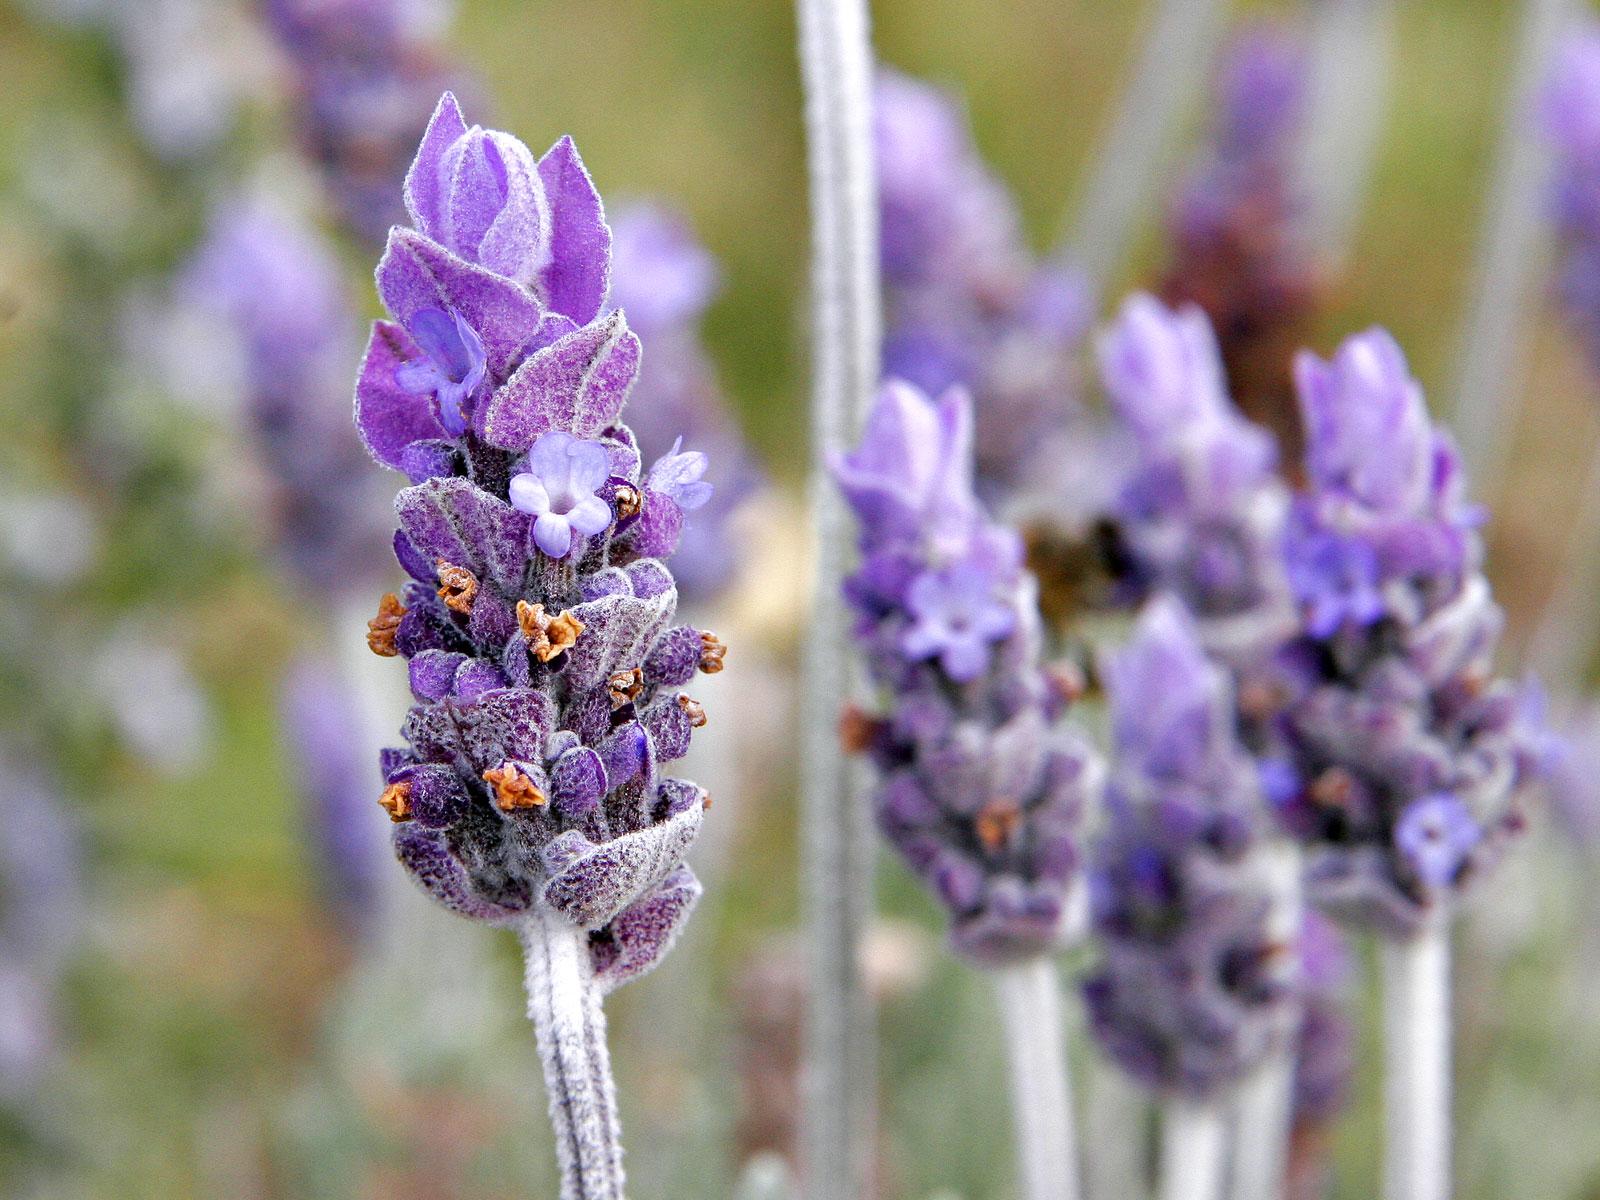 Single_lavendar_flower02